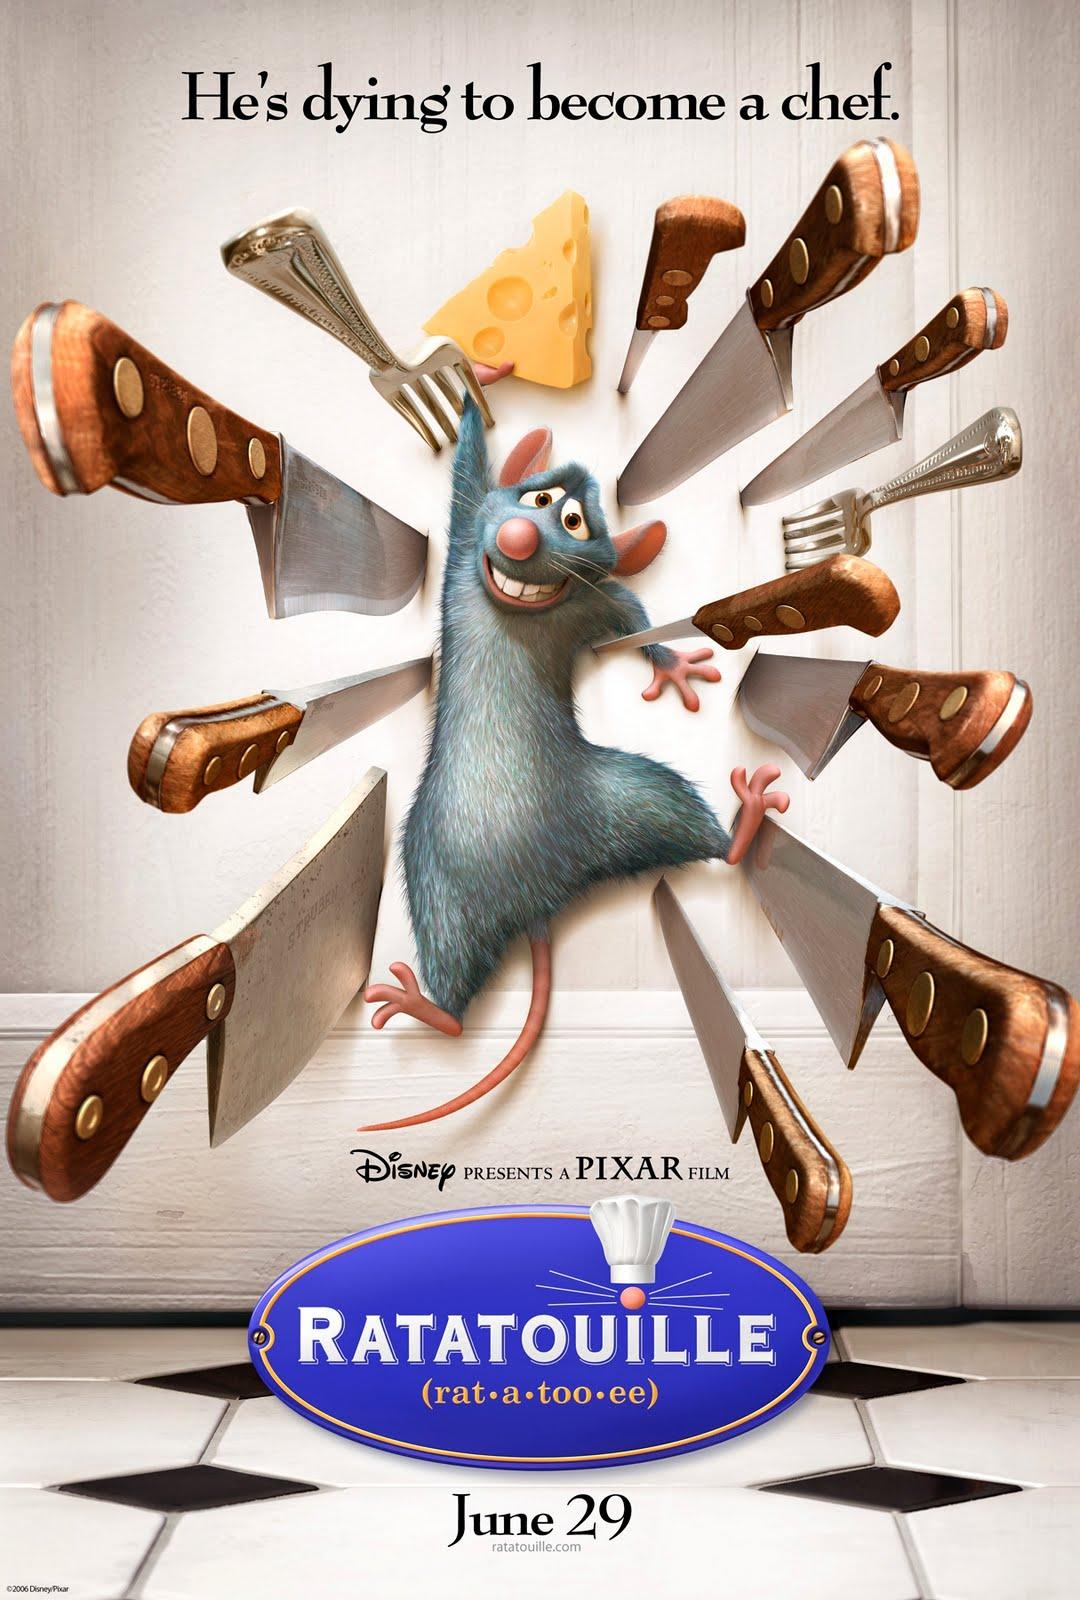 Ratatouille-poster-ratatouille-324474_1215_1800.jpg